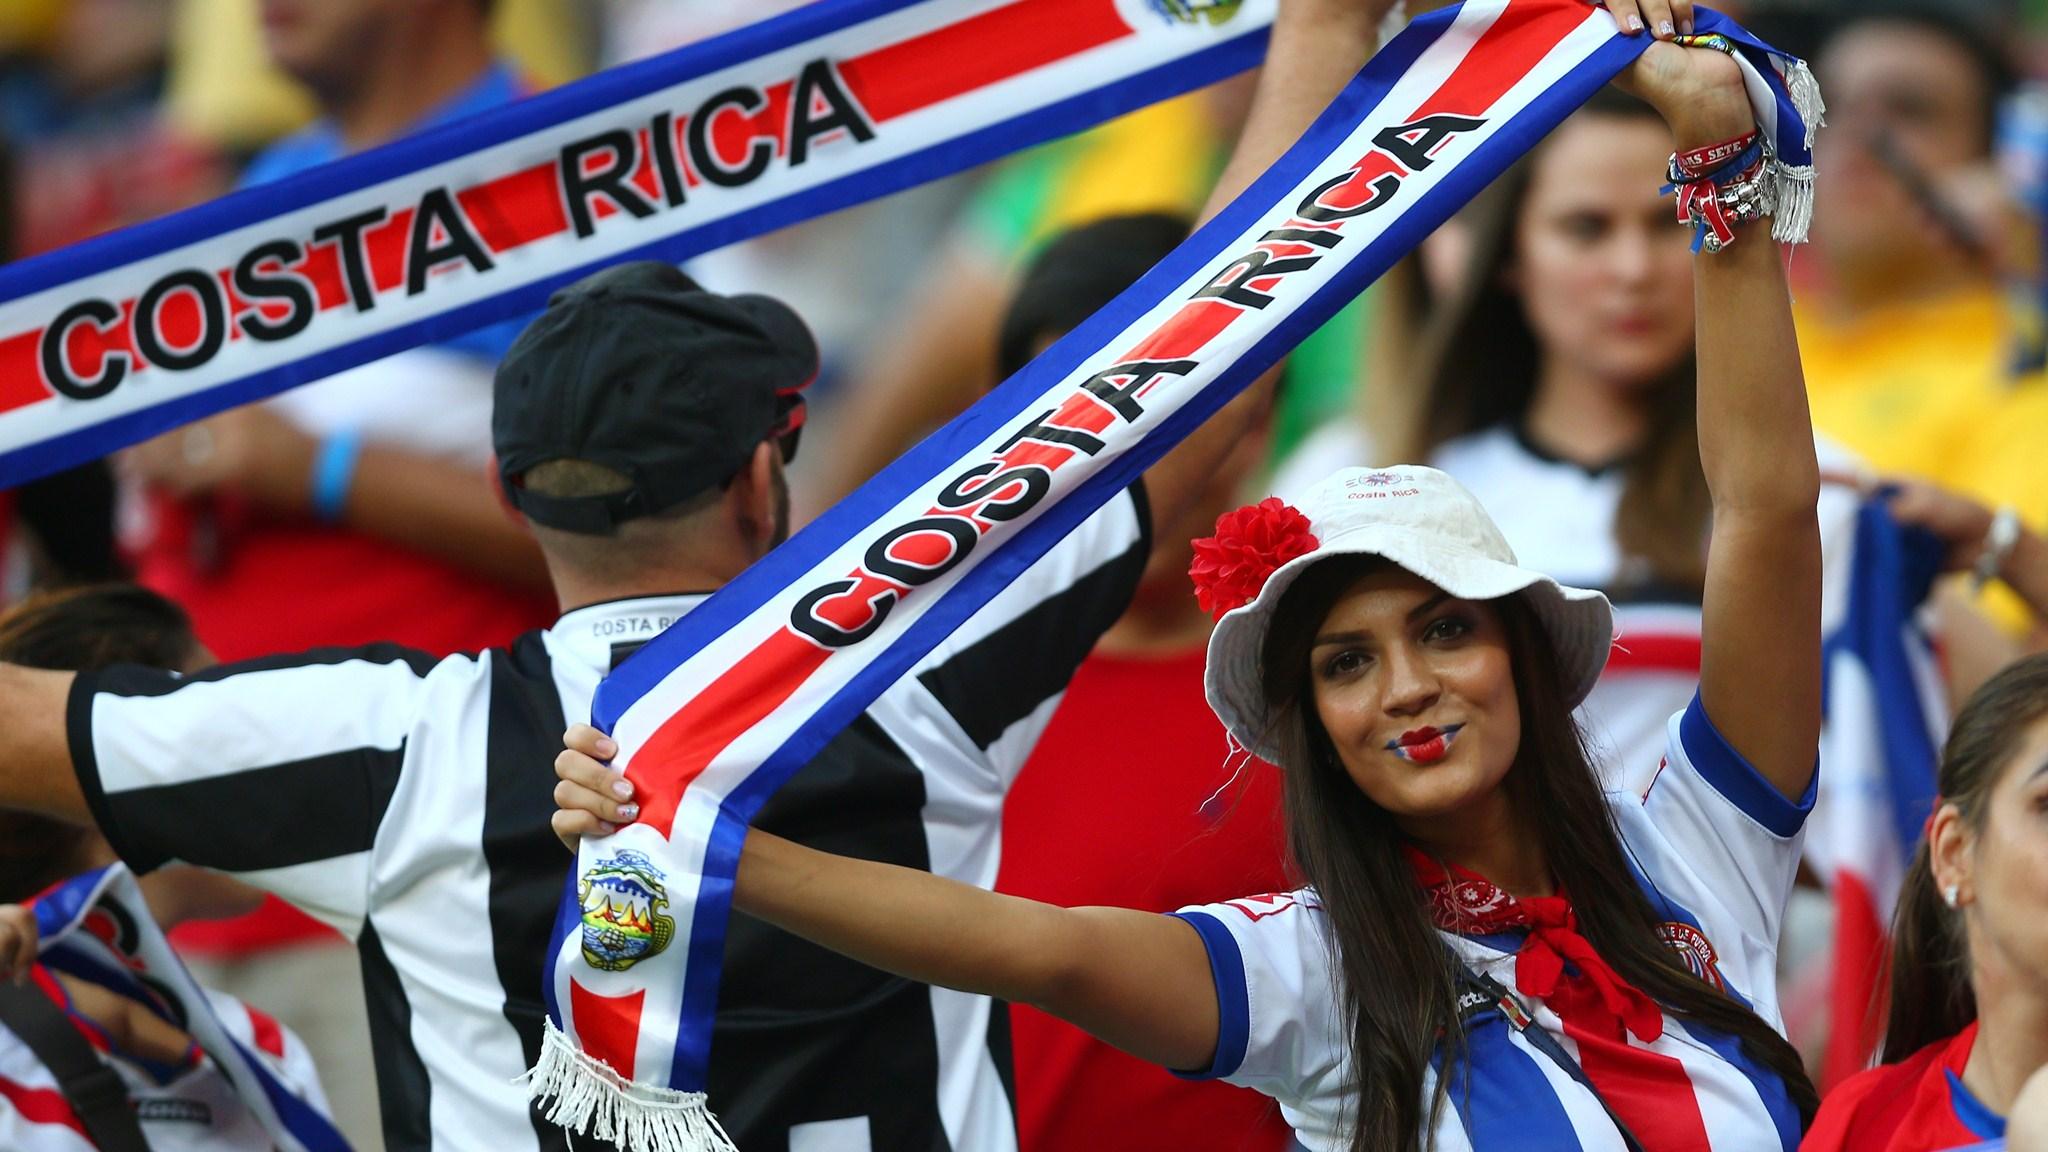 178 - Costa Rica-Greece [1-1 - Costa Rica win on penalties (5 - 3)] -- 29 Jun 2014 - 17-00